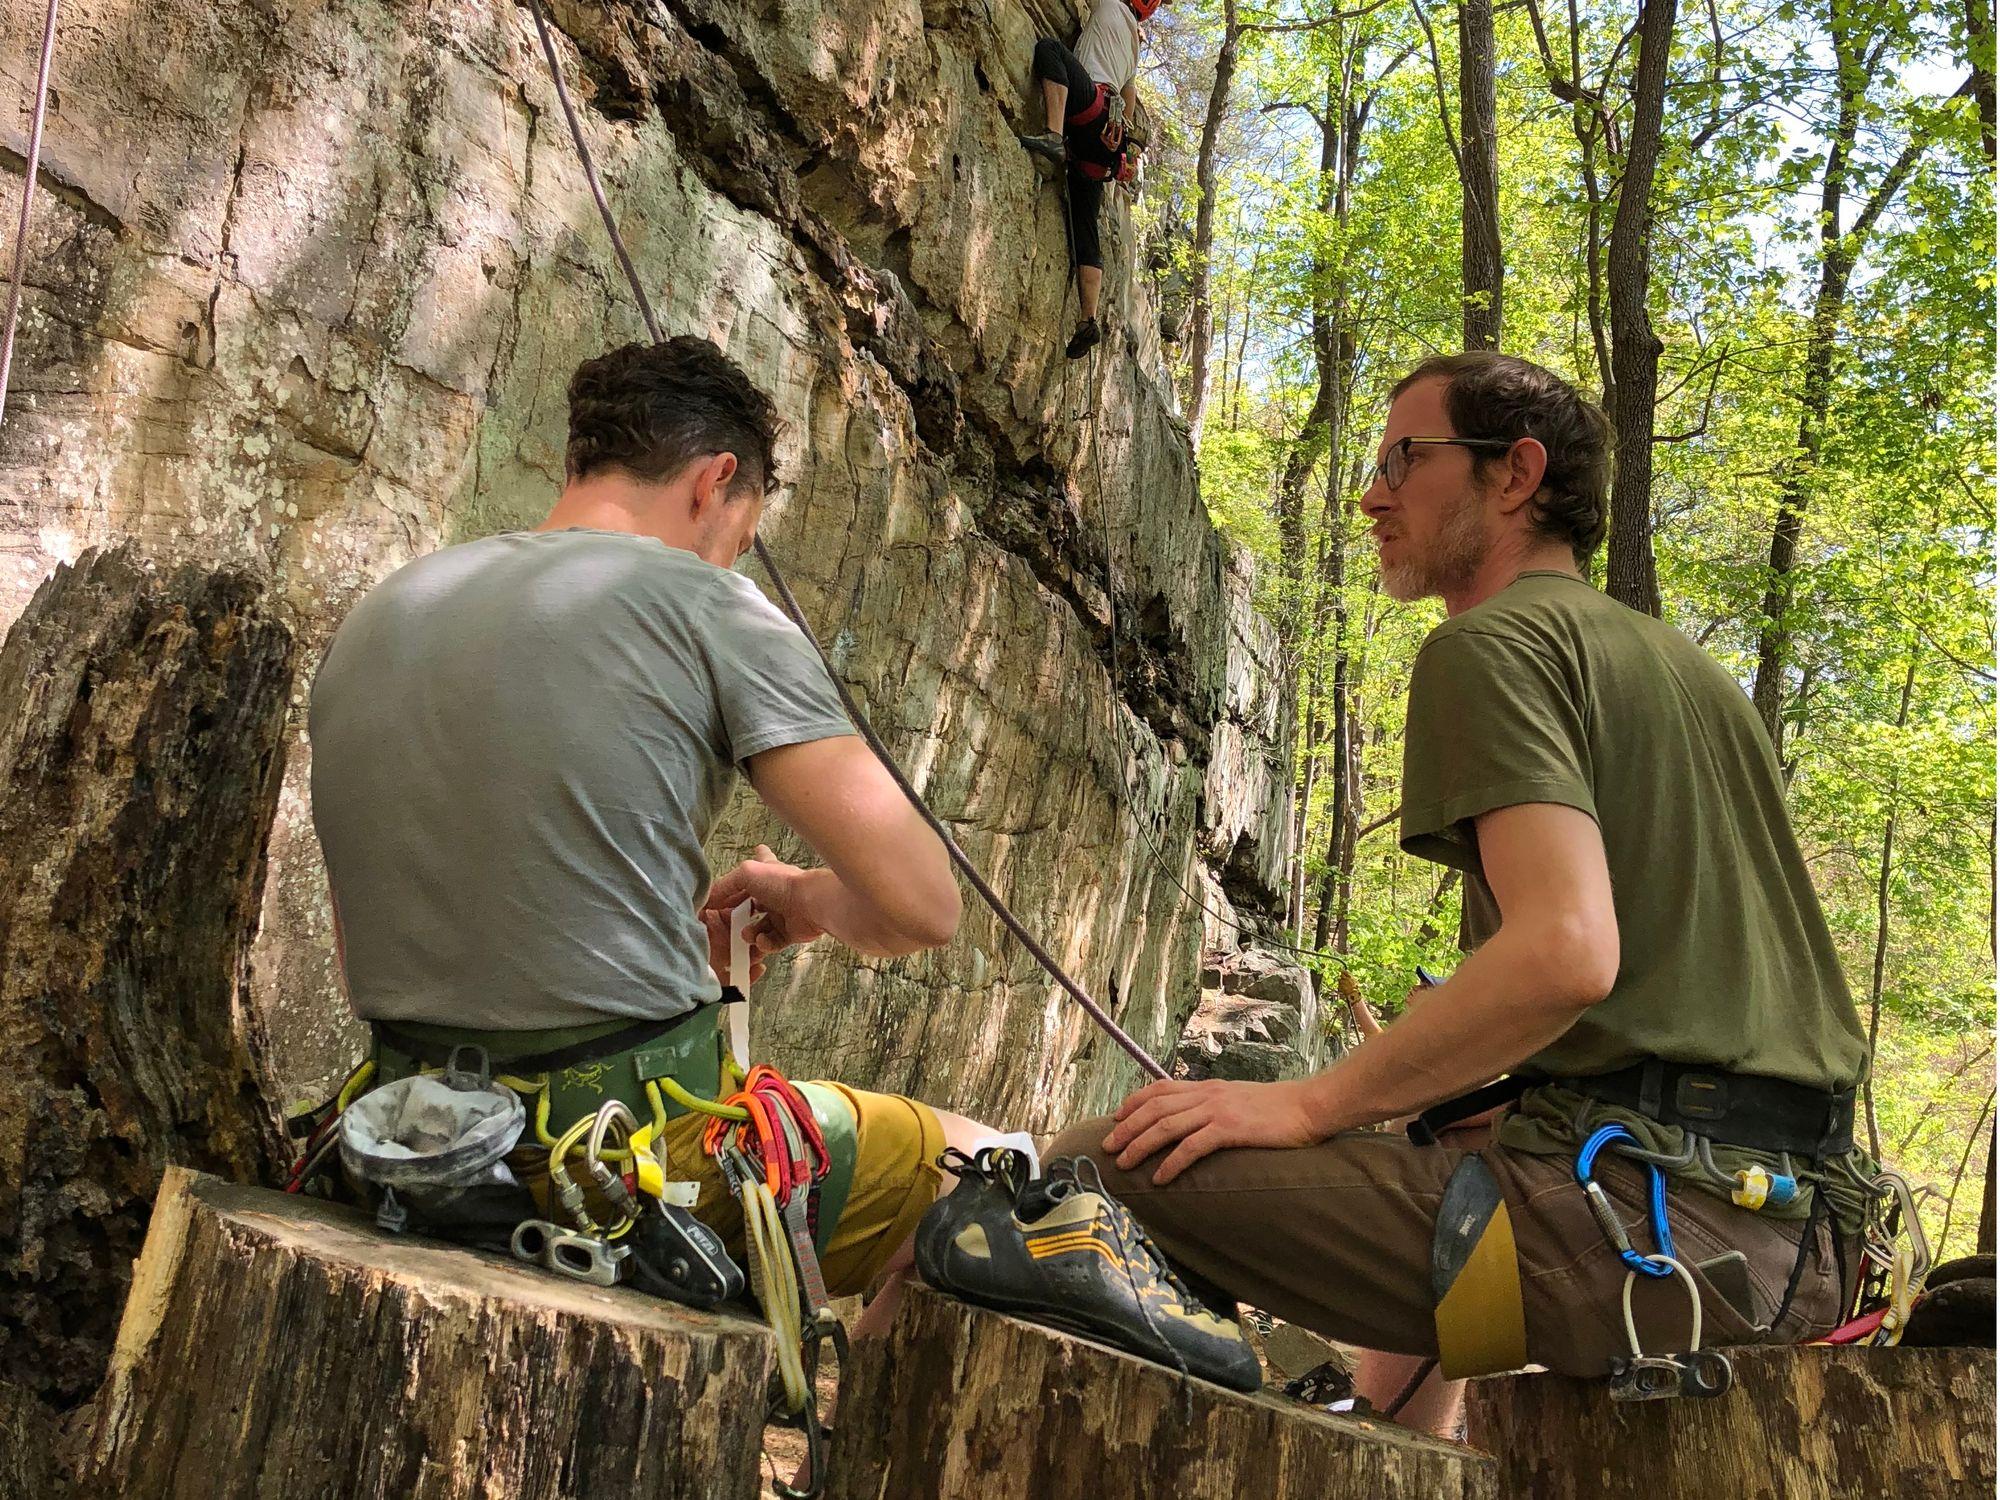 Rock climbers at Foster Falls